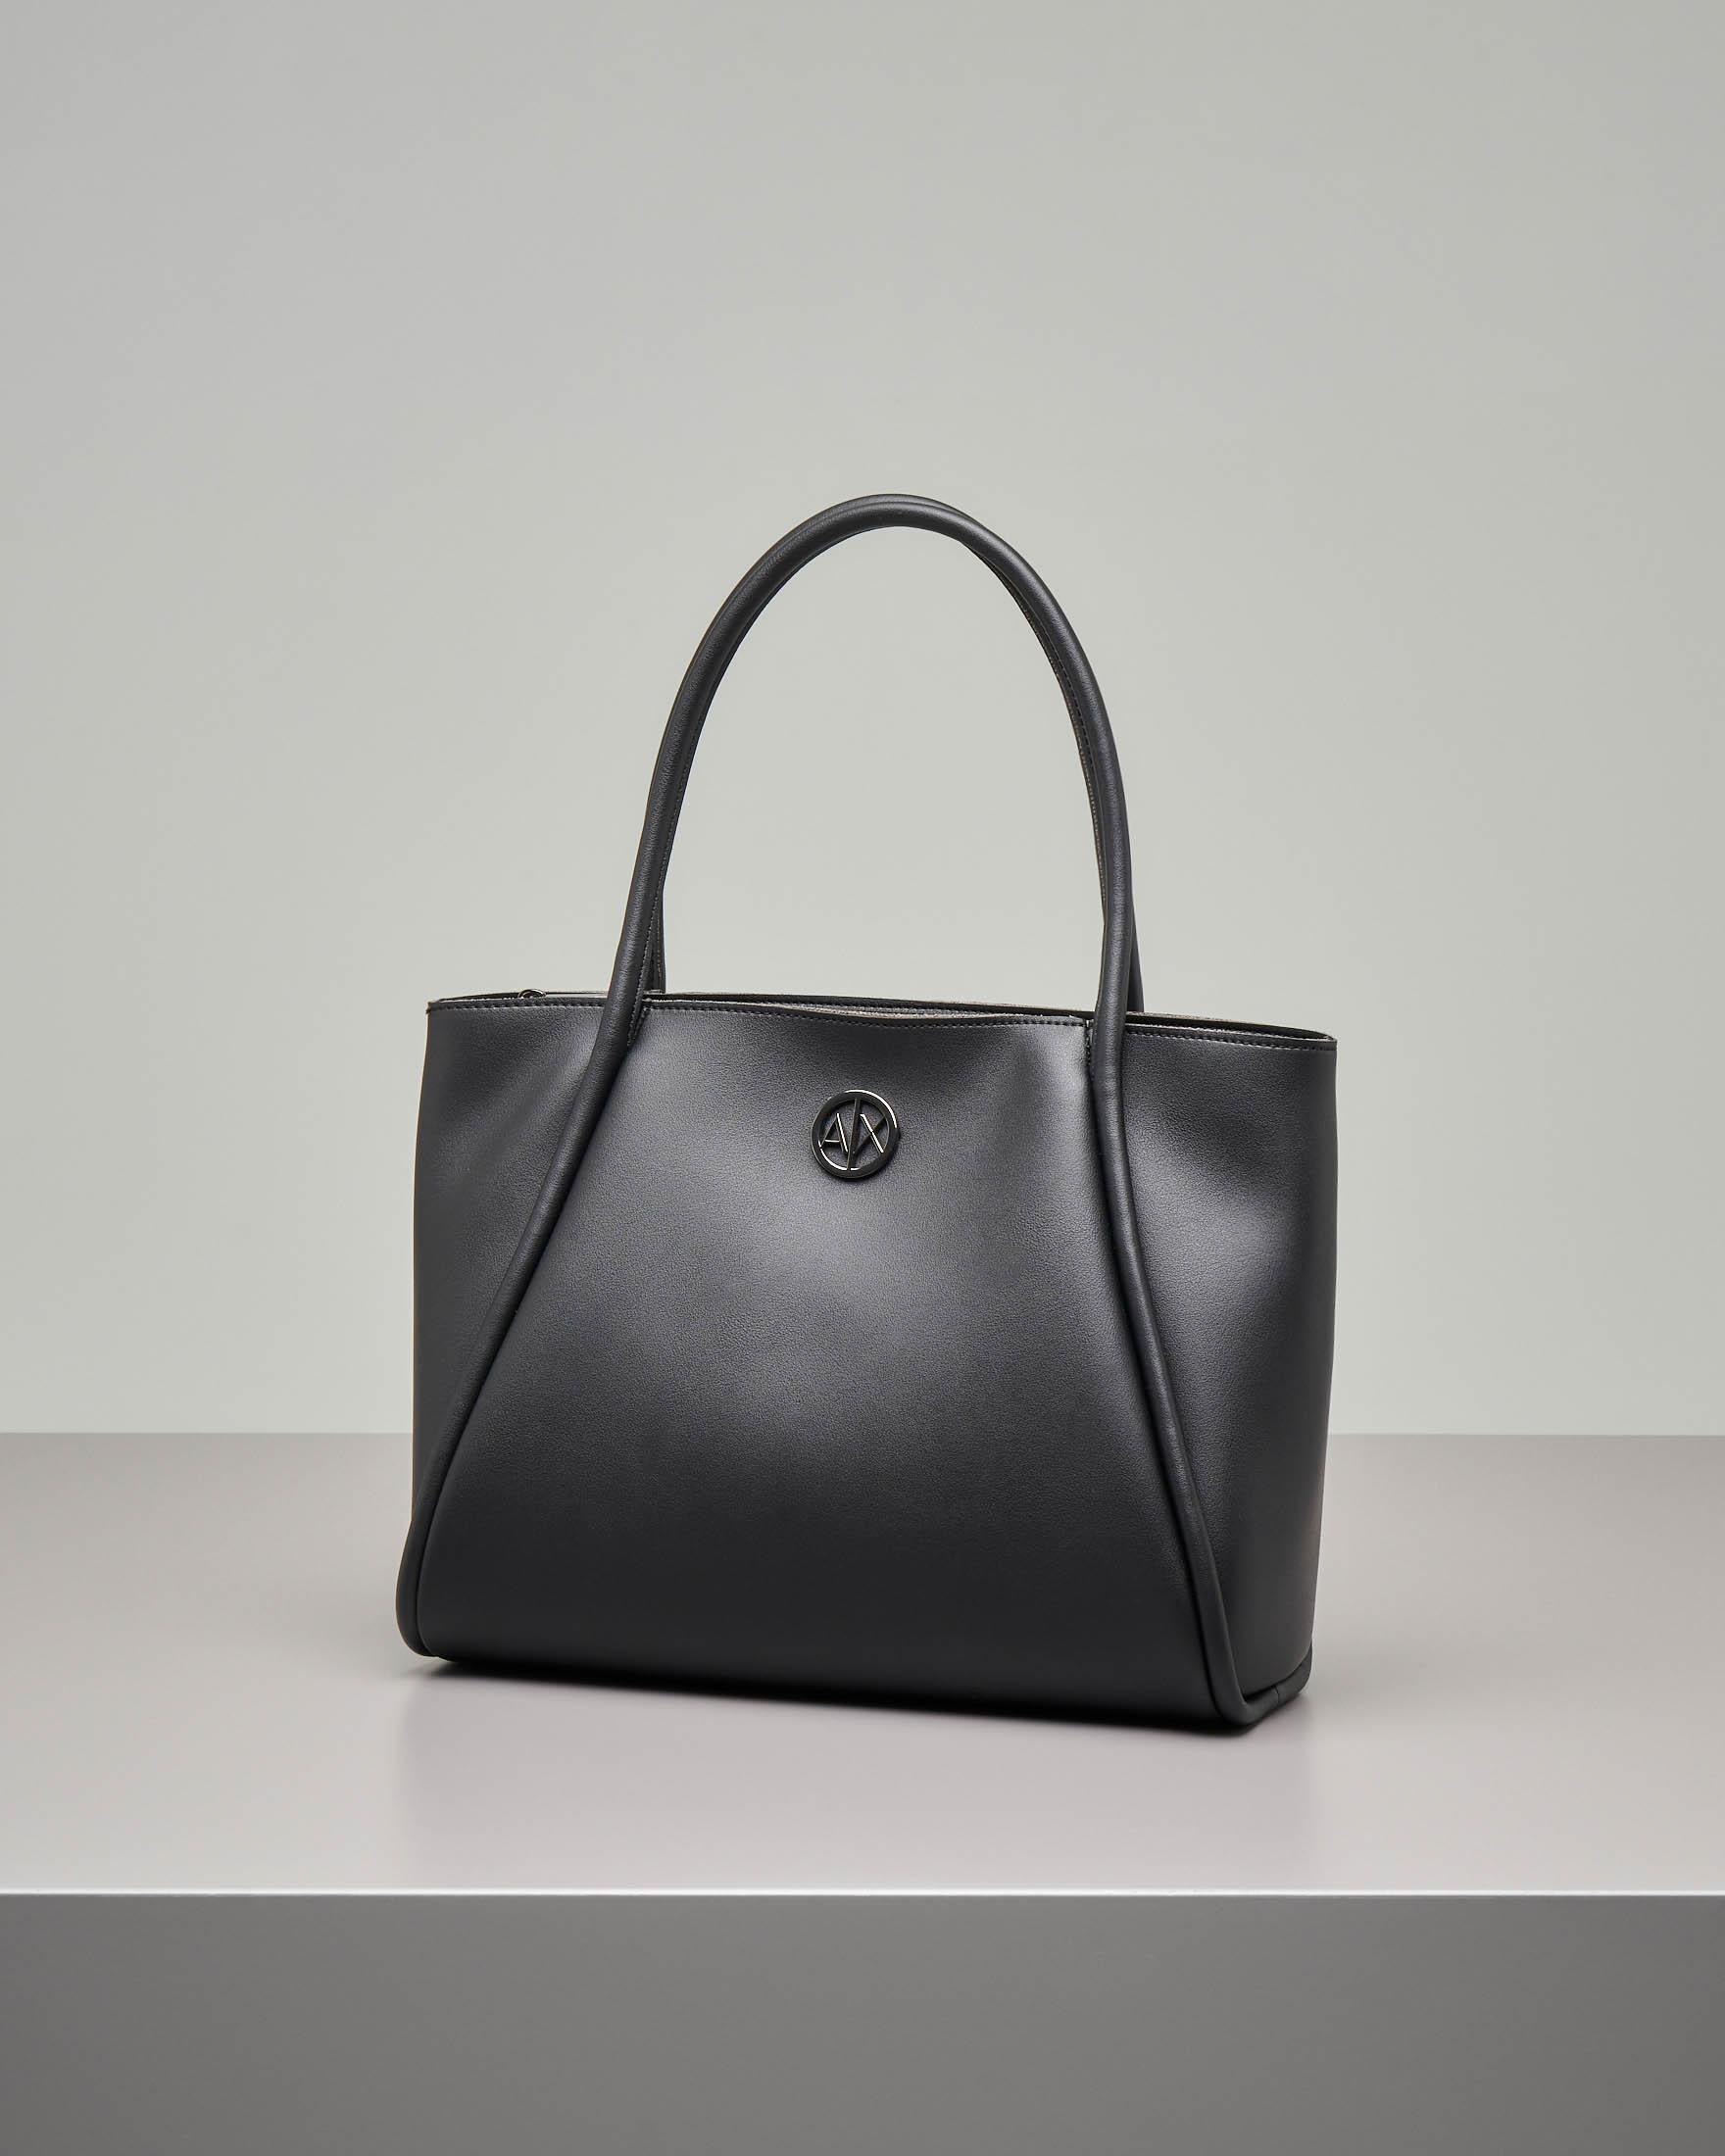 Shopping bag nera in ecopelle effetto liscio con monogramma logo applicato